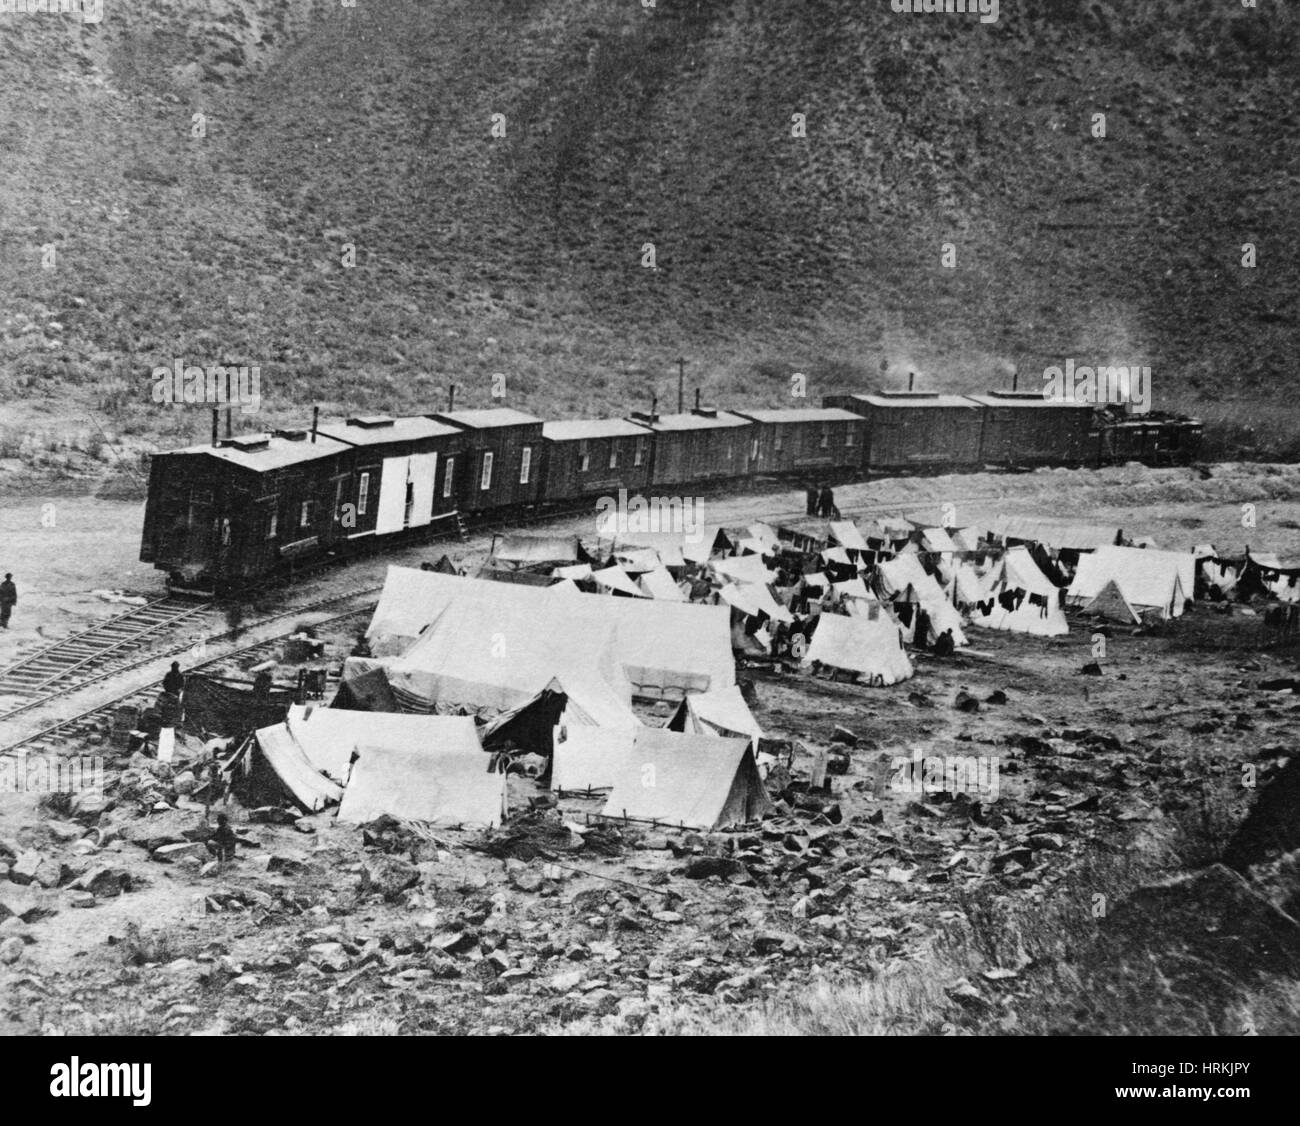 Transcontinental Railroad Word Search Transcontinental